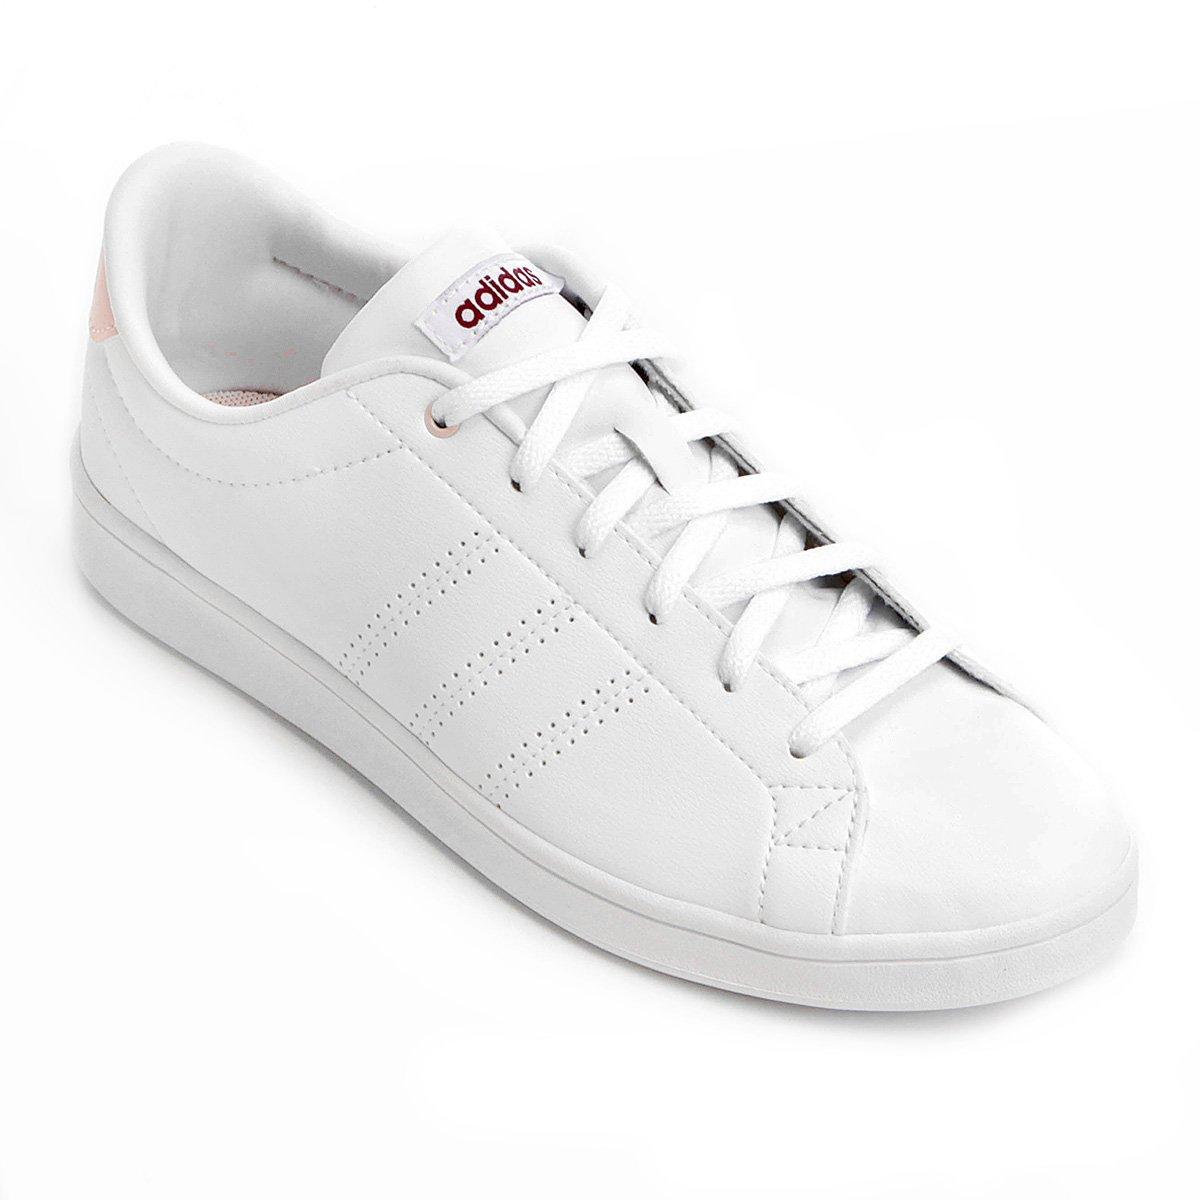 2727ae750c1 Tênis Adidas Advantage Clean Qt Feminino - Branco - Compre Agora ...